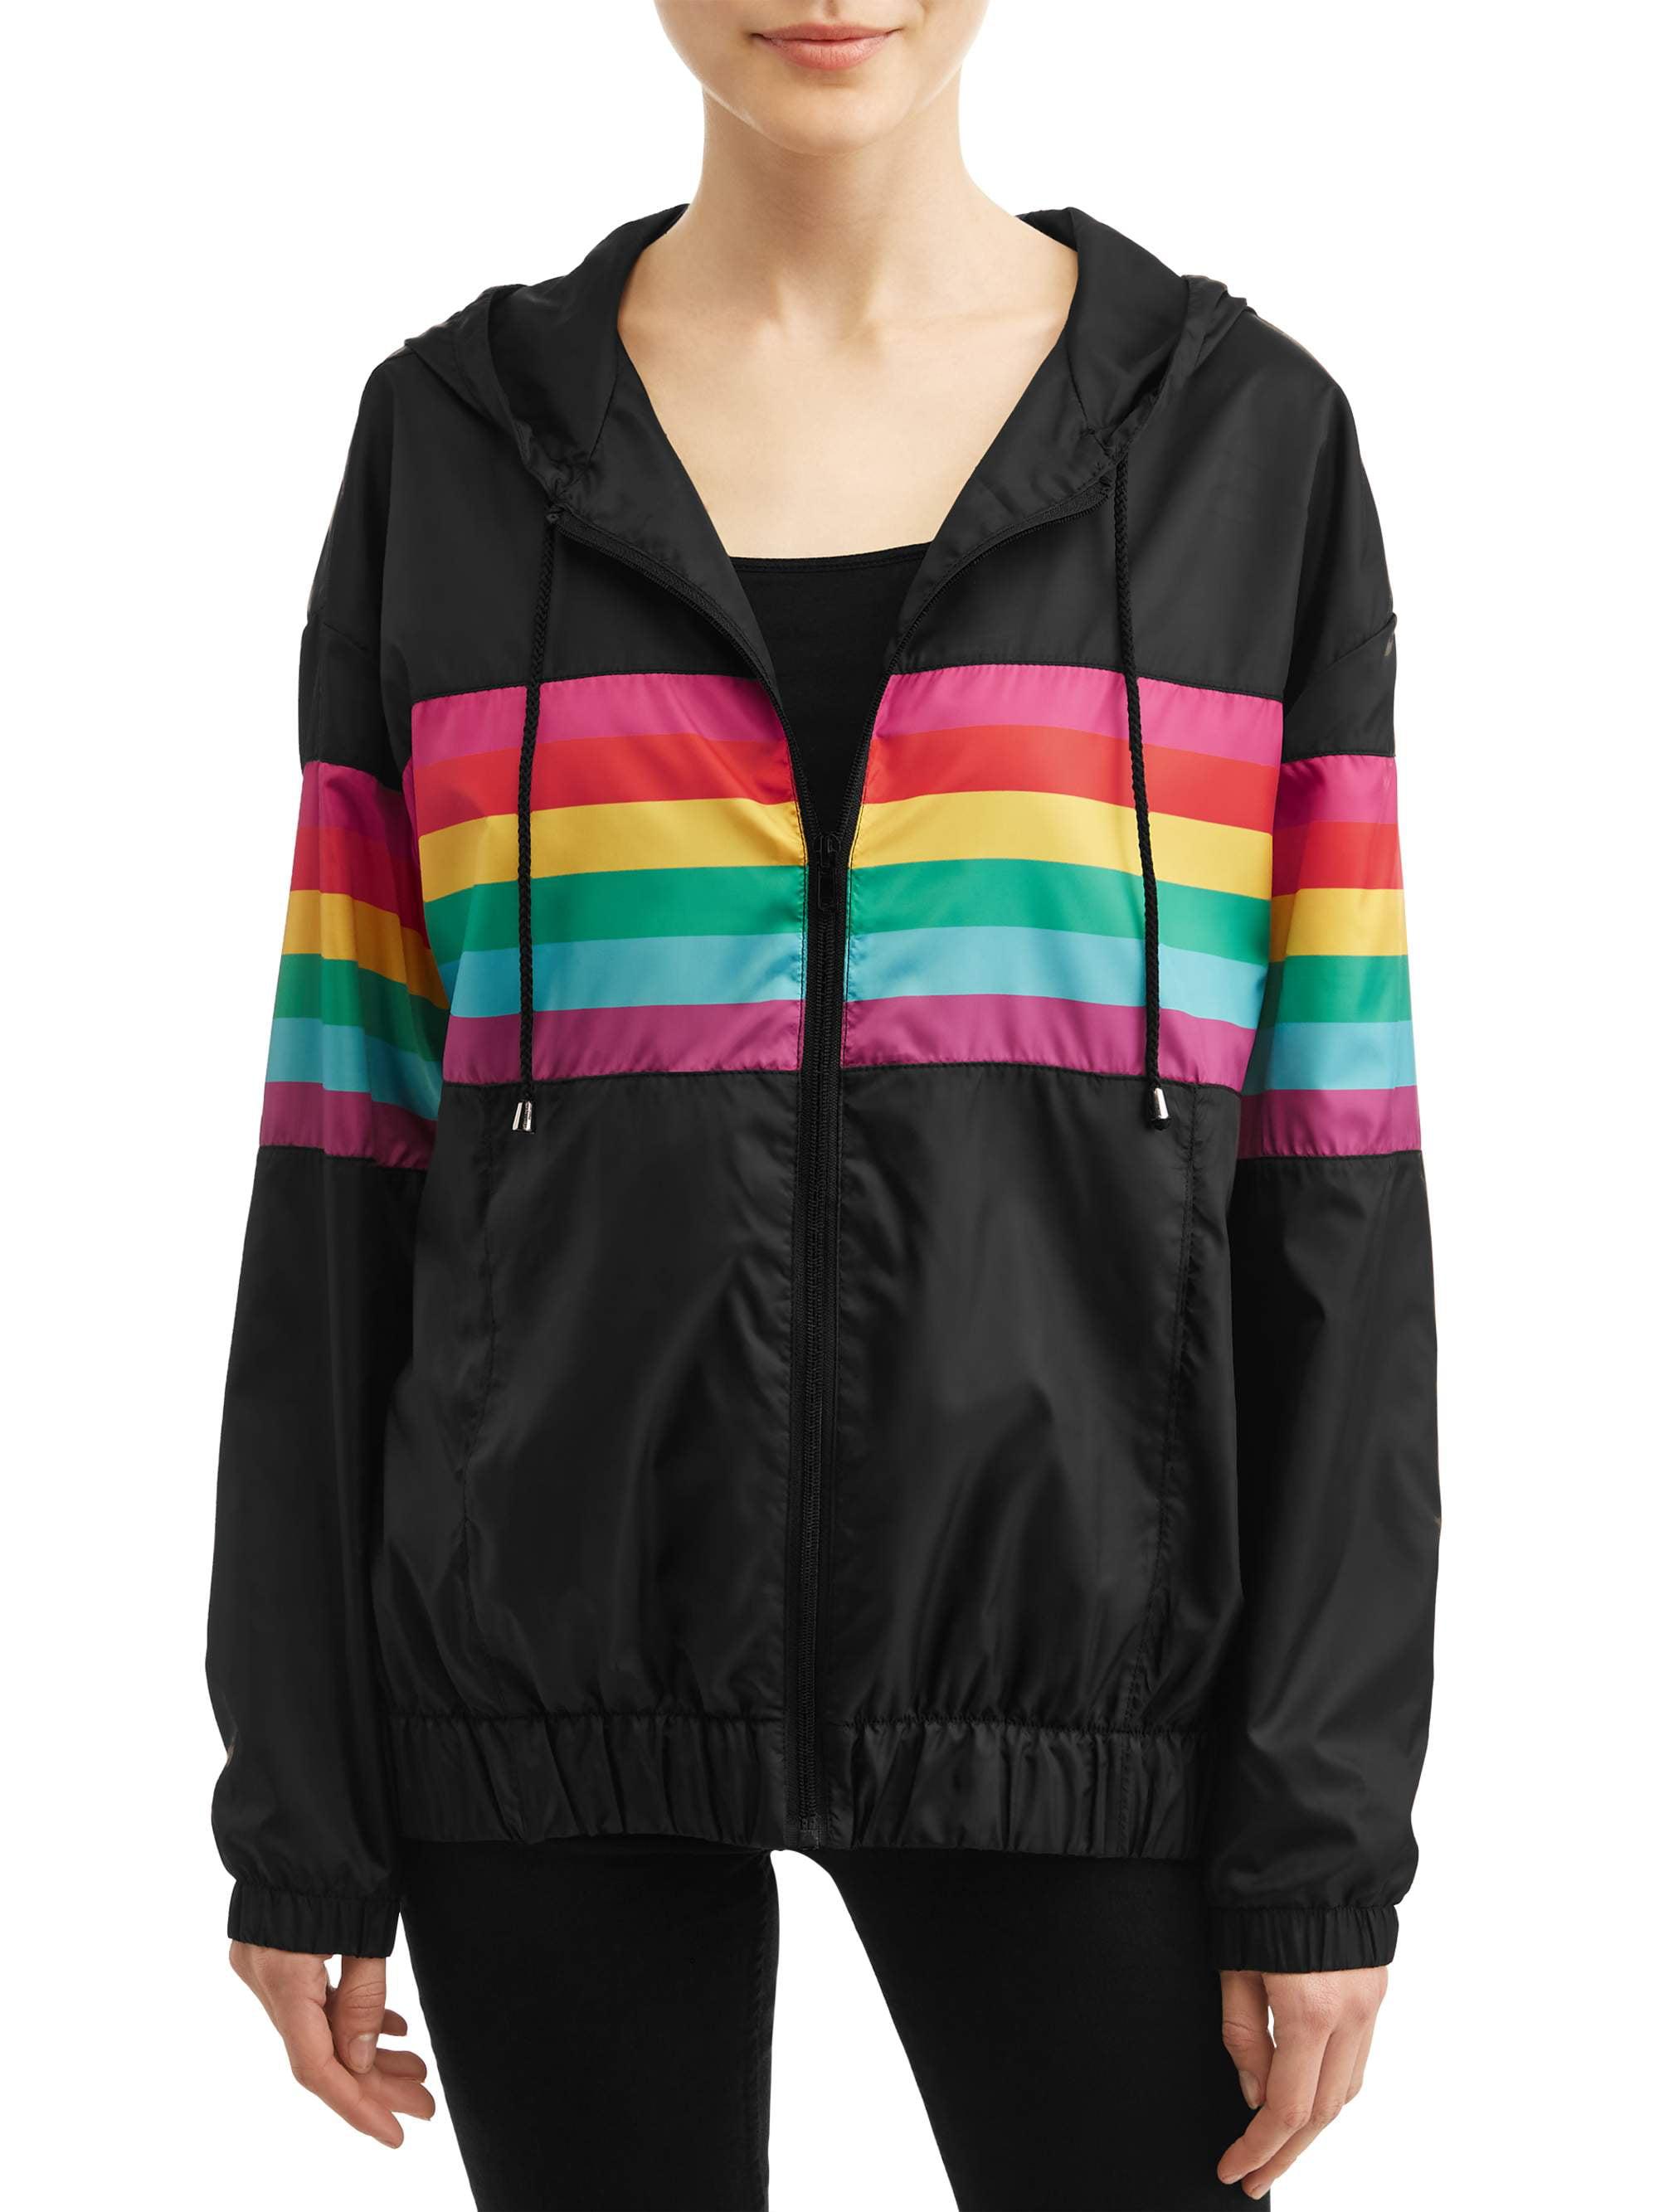 Rainbow Striped Hooded Windbreaker Jacket